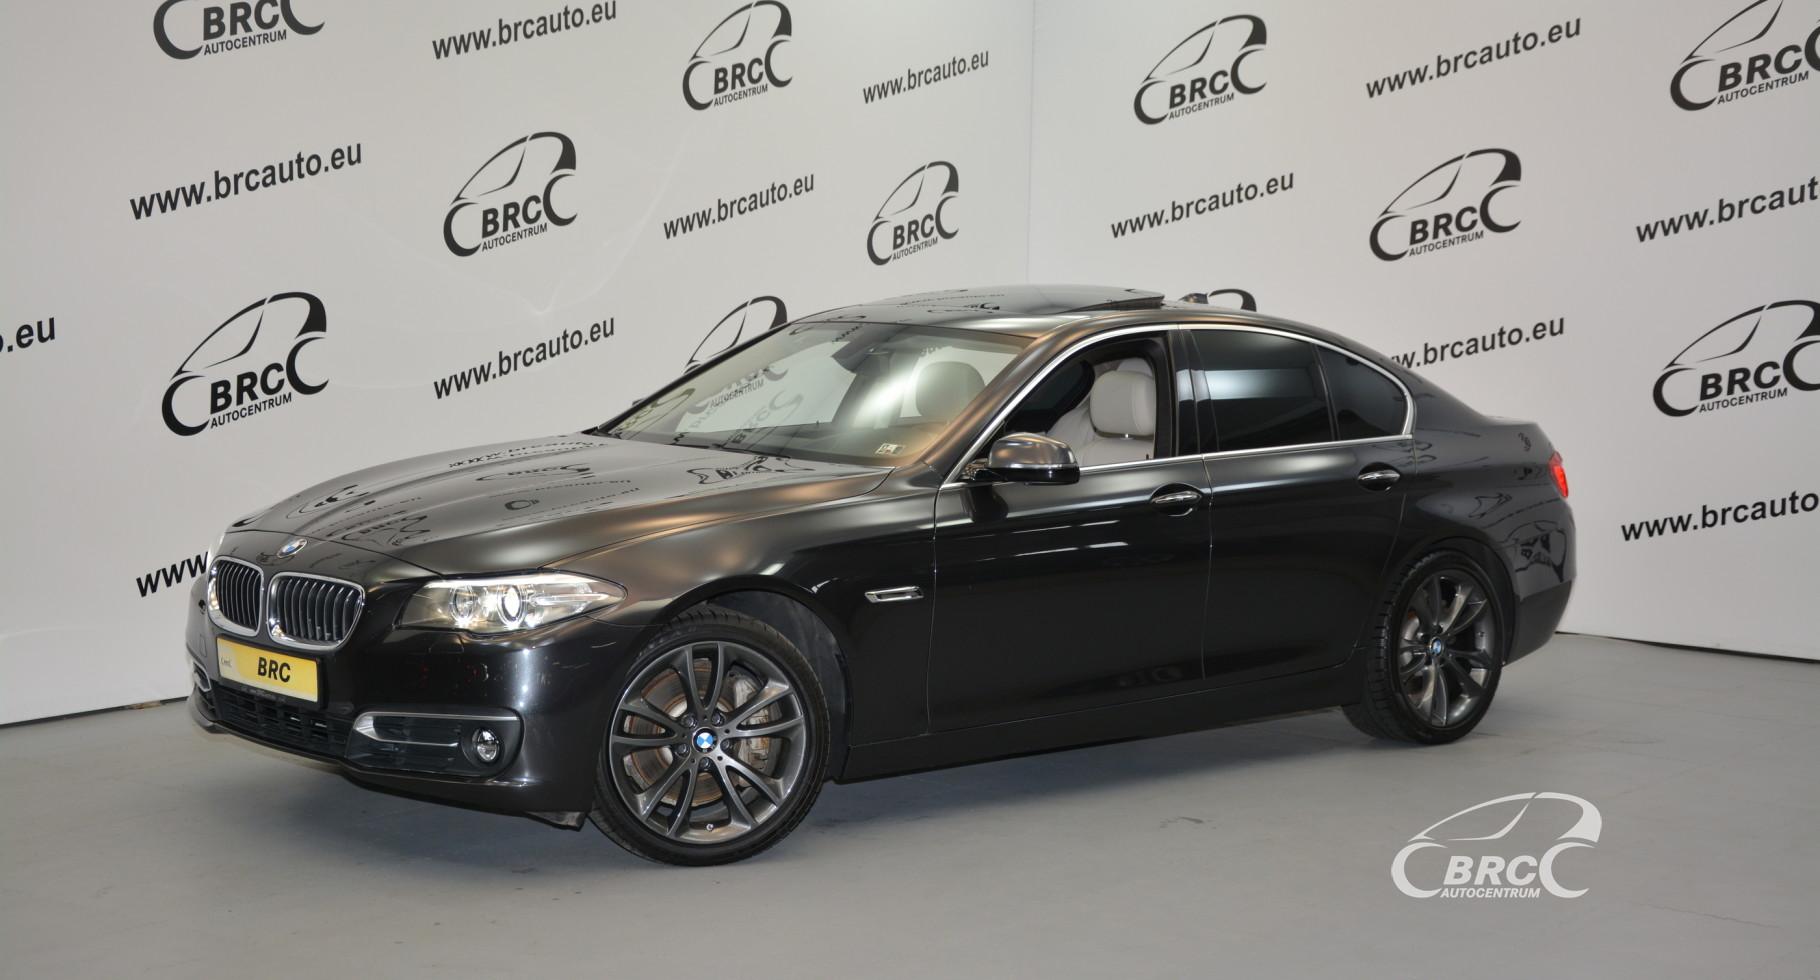 BMW 535 d Luxury XDrive Automatas